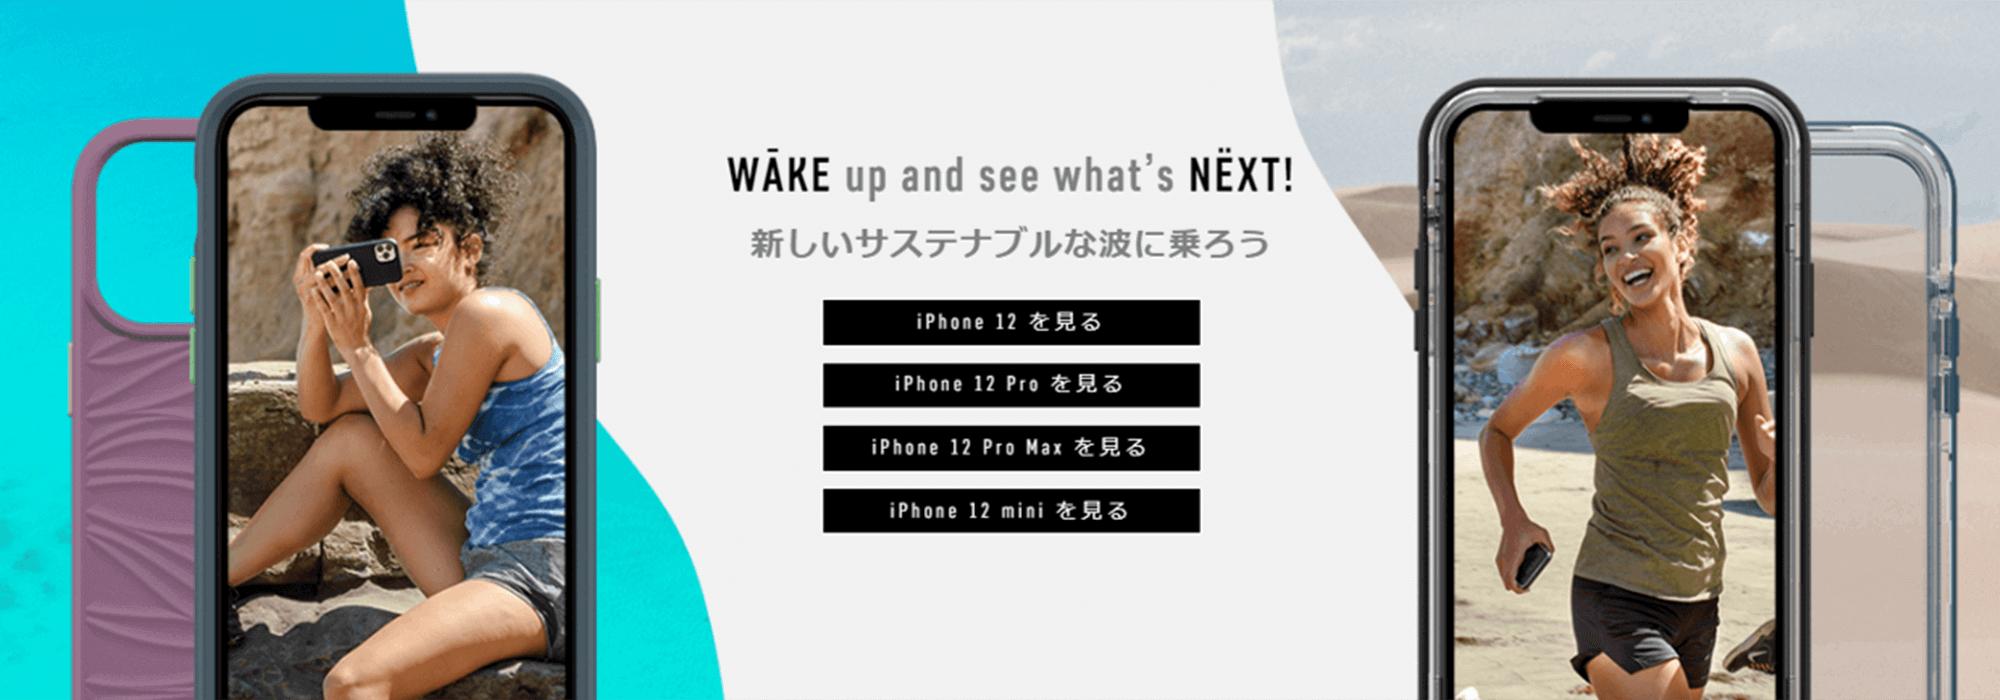 WAKE up and see what's NEXT!新しいサステナブルな波に乗ろう